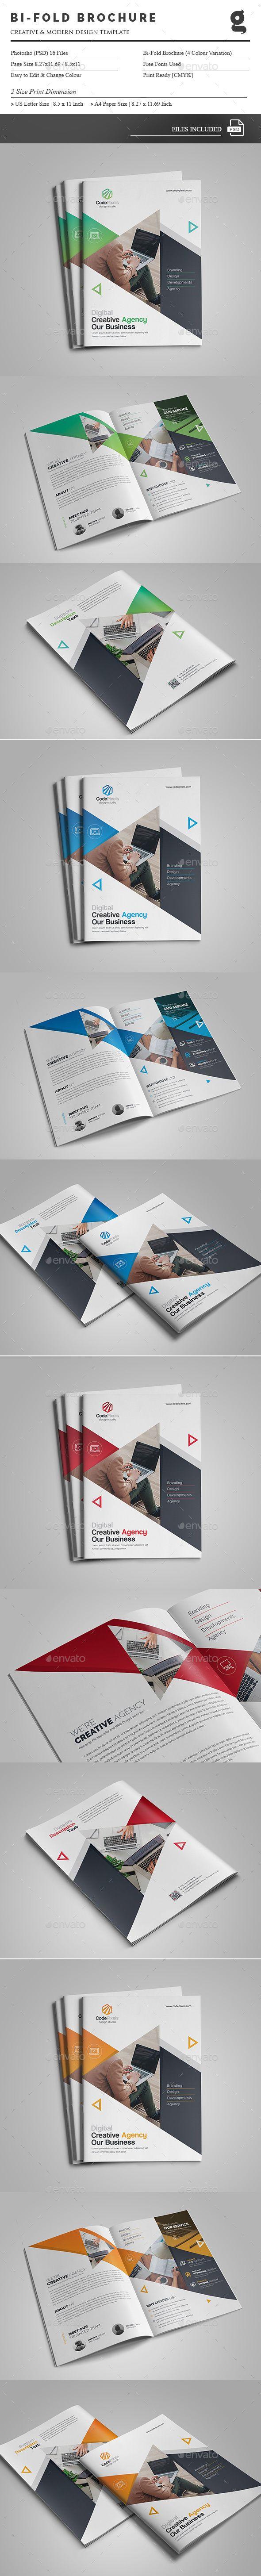 The Bi-Fold Brochure Template PSD - A4 & US Size